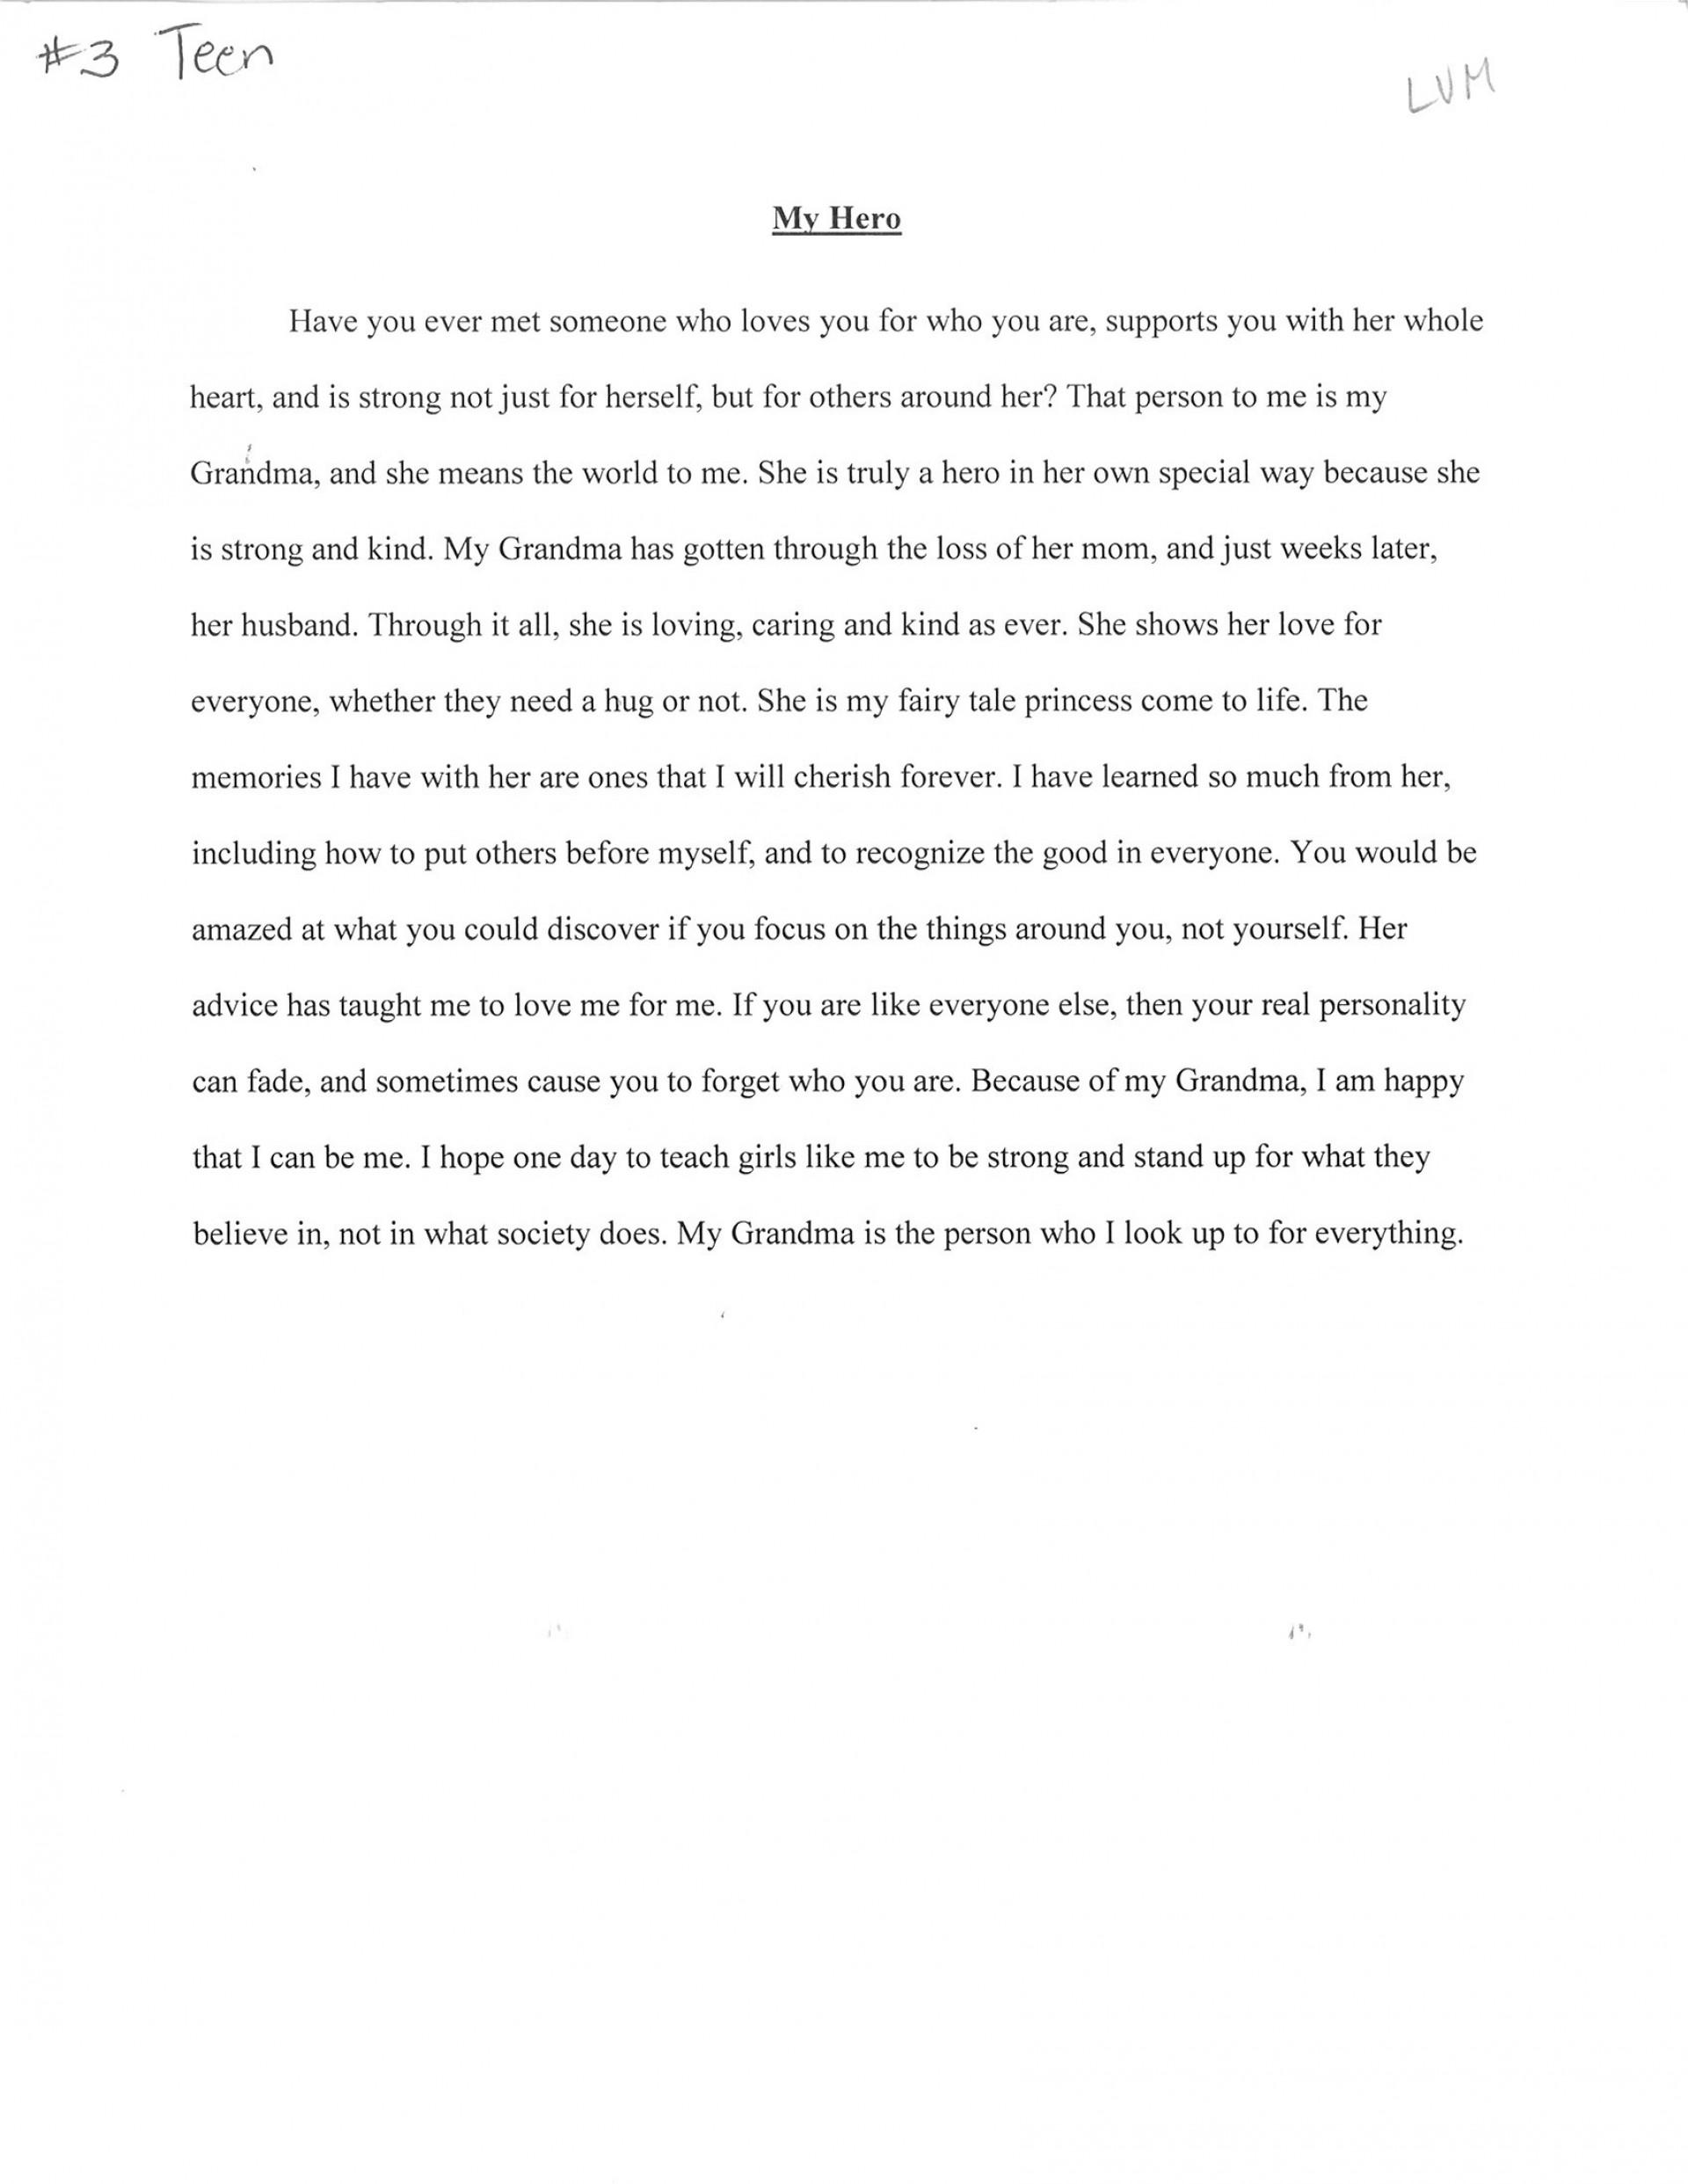 005 Third20place20teen20sarah20horst20 20my20hero An Essay About My Hero Fascinating Heroine Teacher 500 Words A Narrative 1920